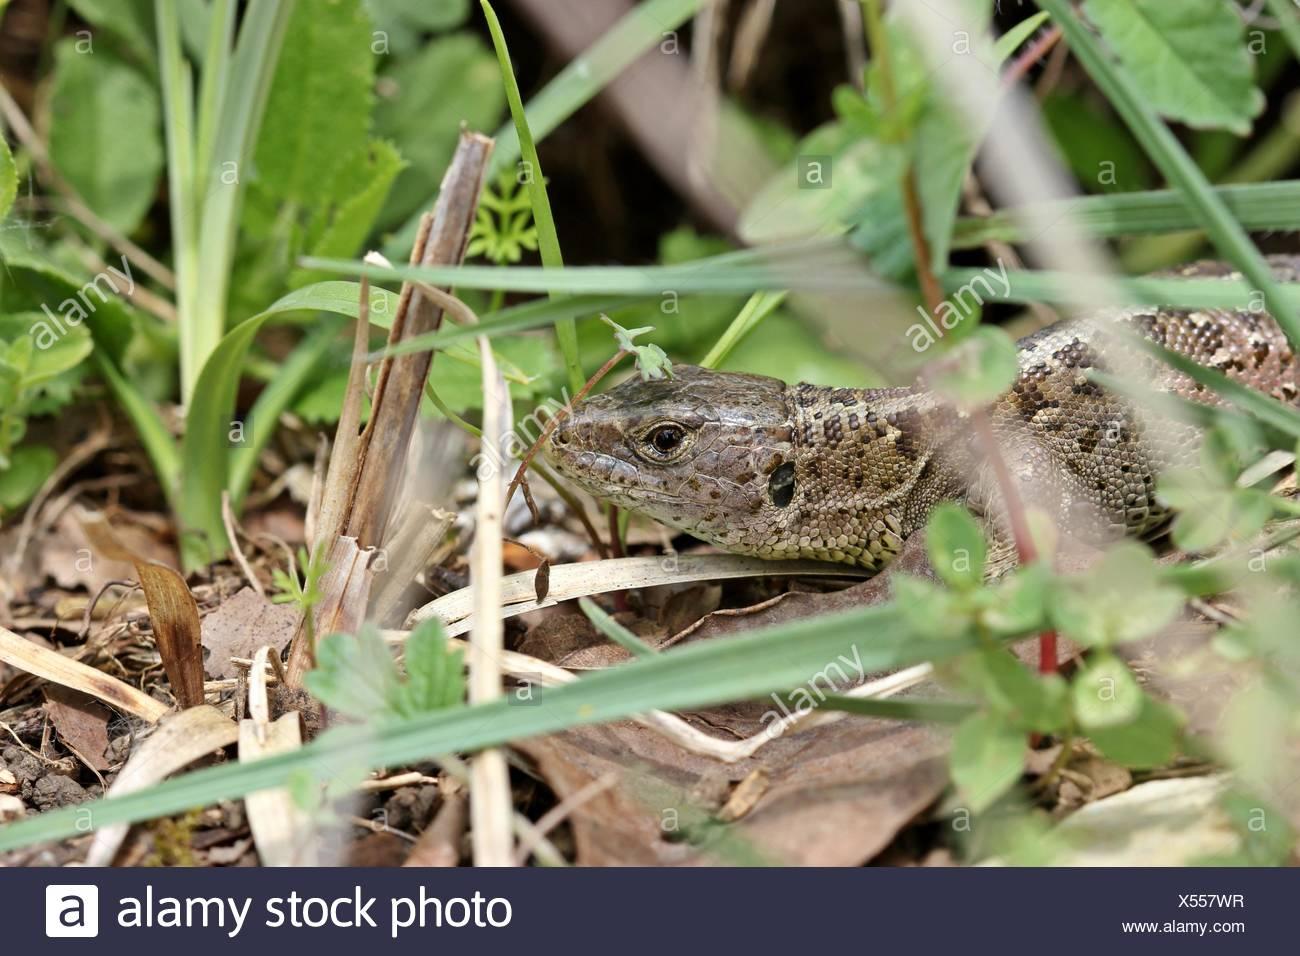 female sand lizard (lacerta agilis) - Stock Image